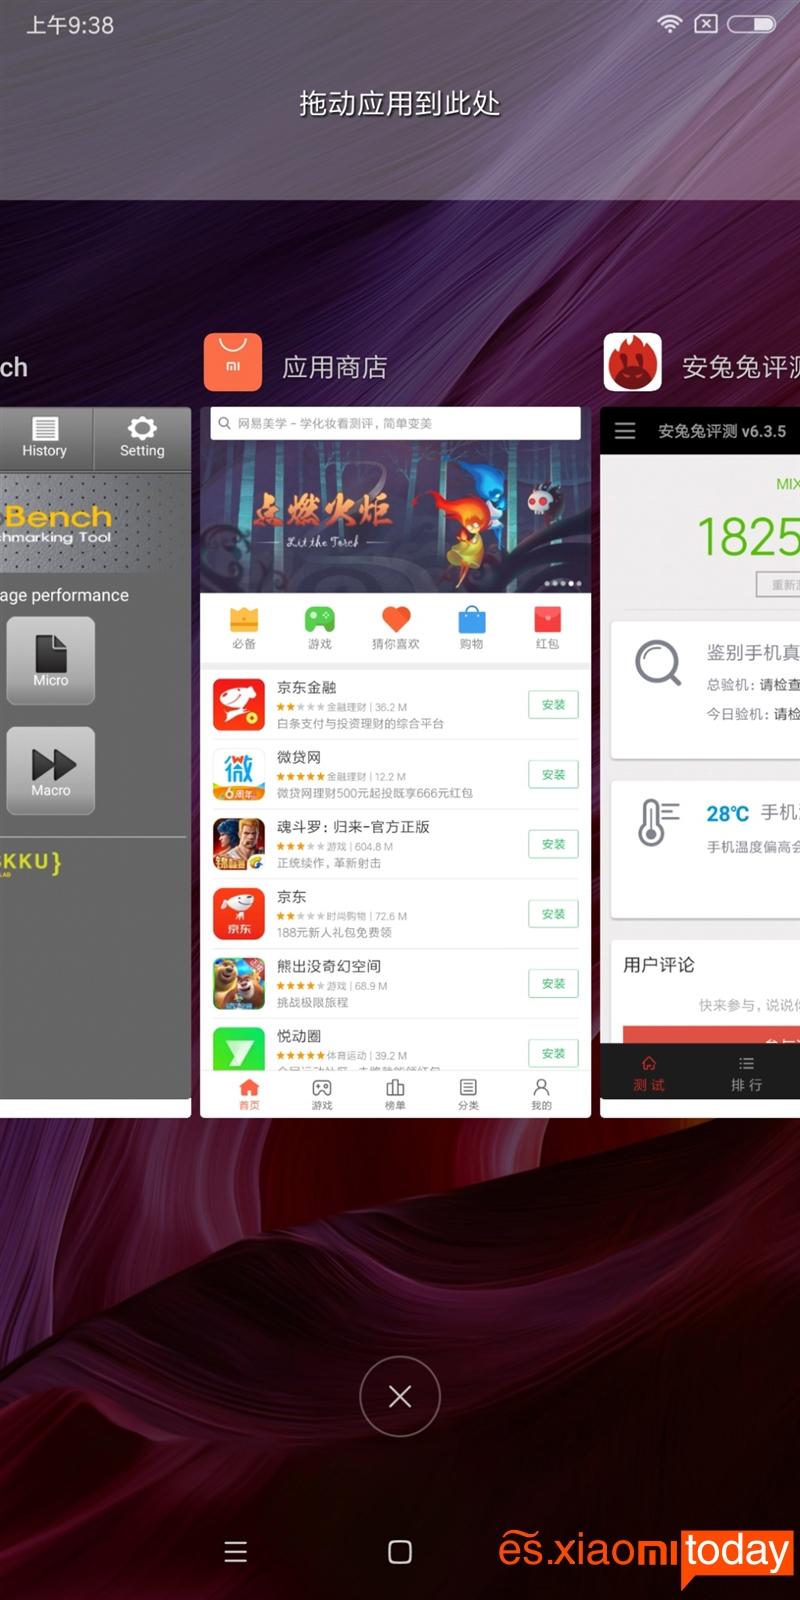 Xiaomi Mi MIX - MIUI 9